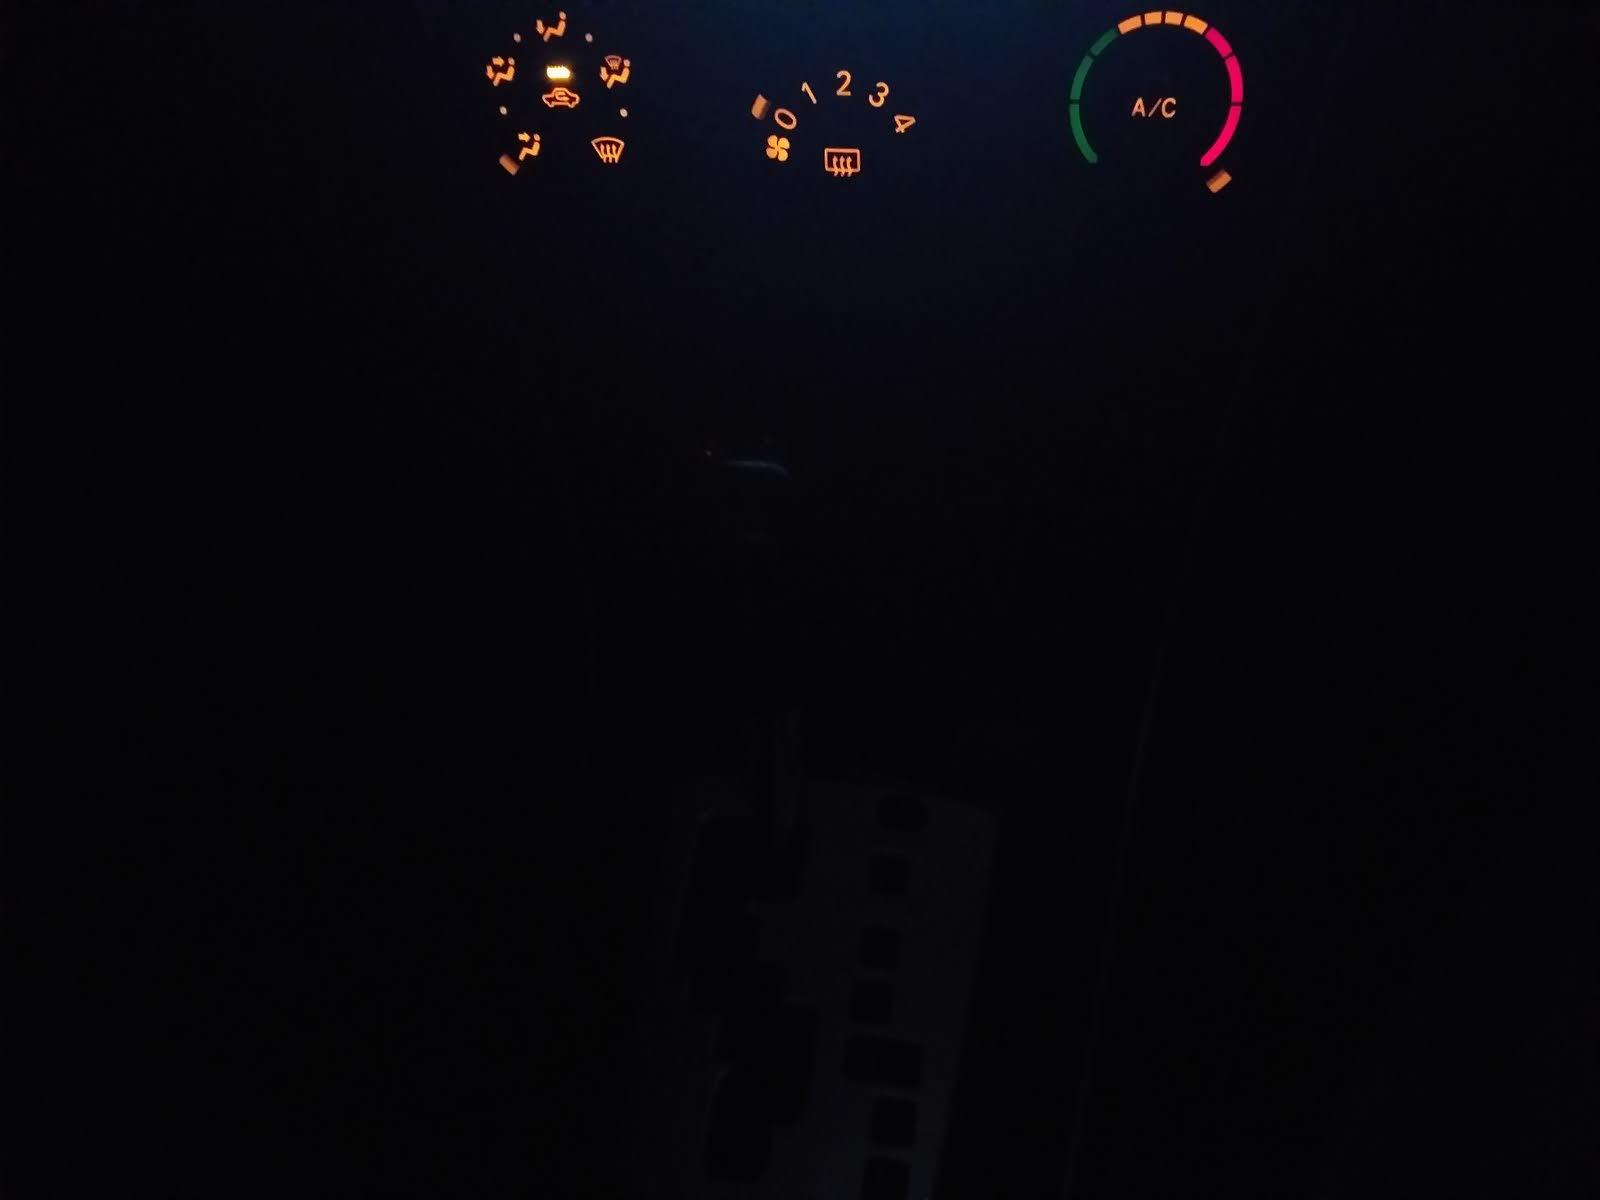 Toyota Corolla Questions - MY Toyota Gear Indicator lights